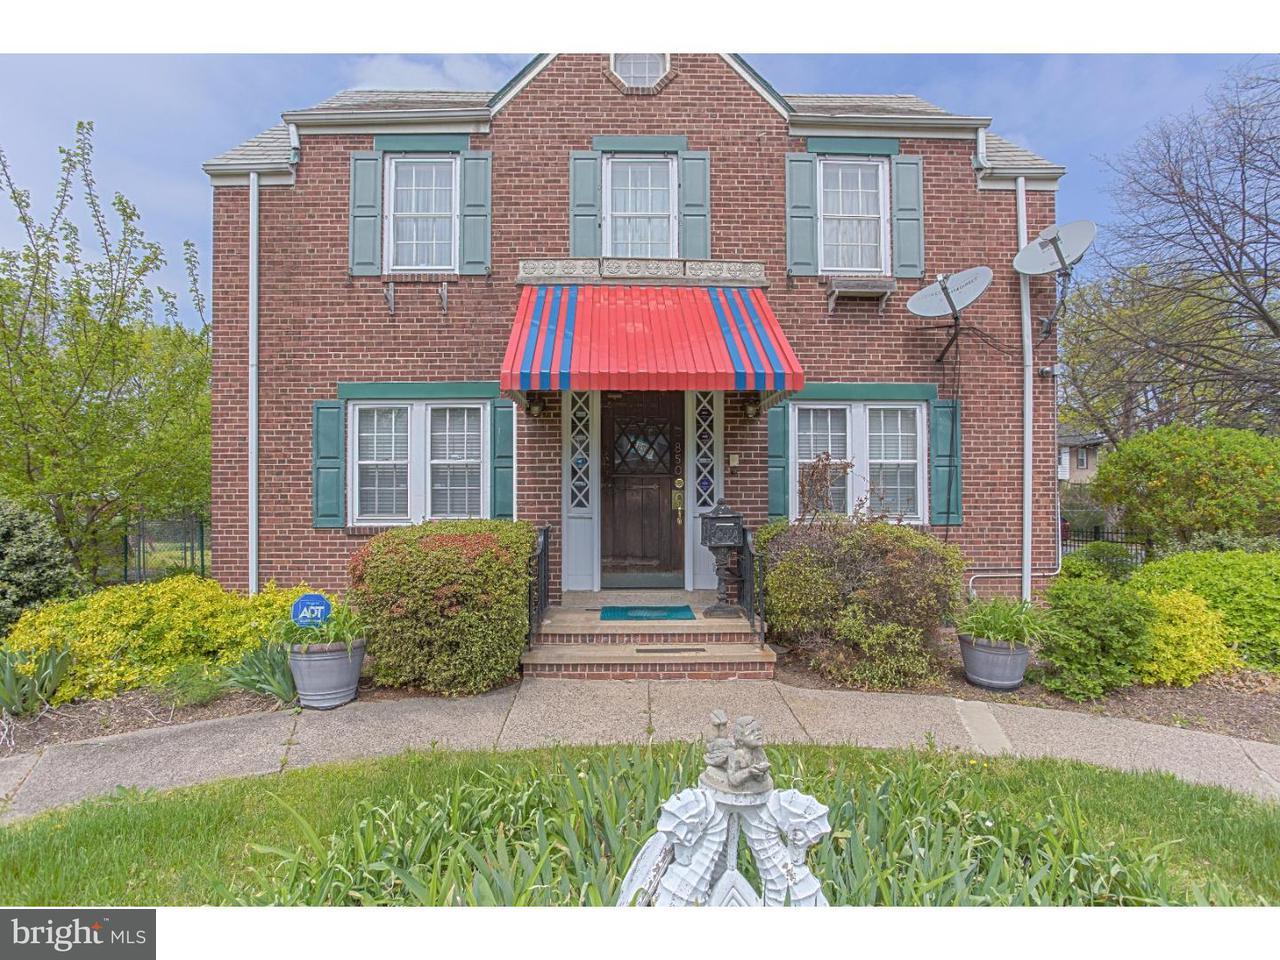 Single Family Home for Sale at 850 HAMILTON Avenue Trenton, New Jersey 08629 United StatesMunicipality: Trenton City